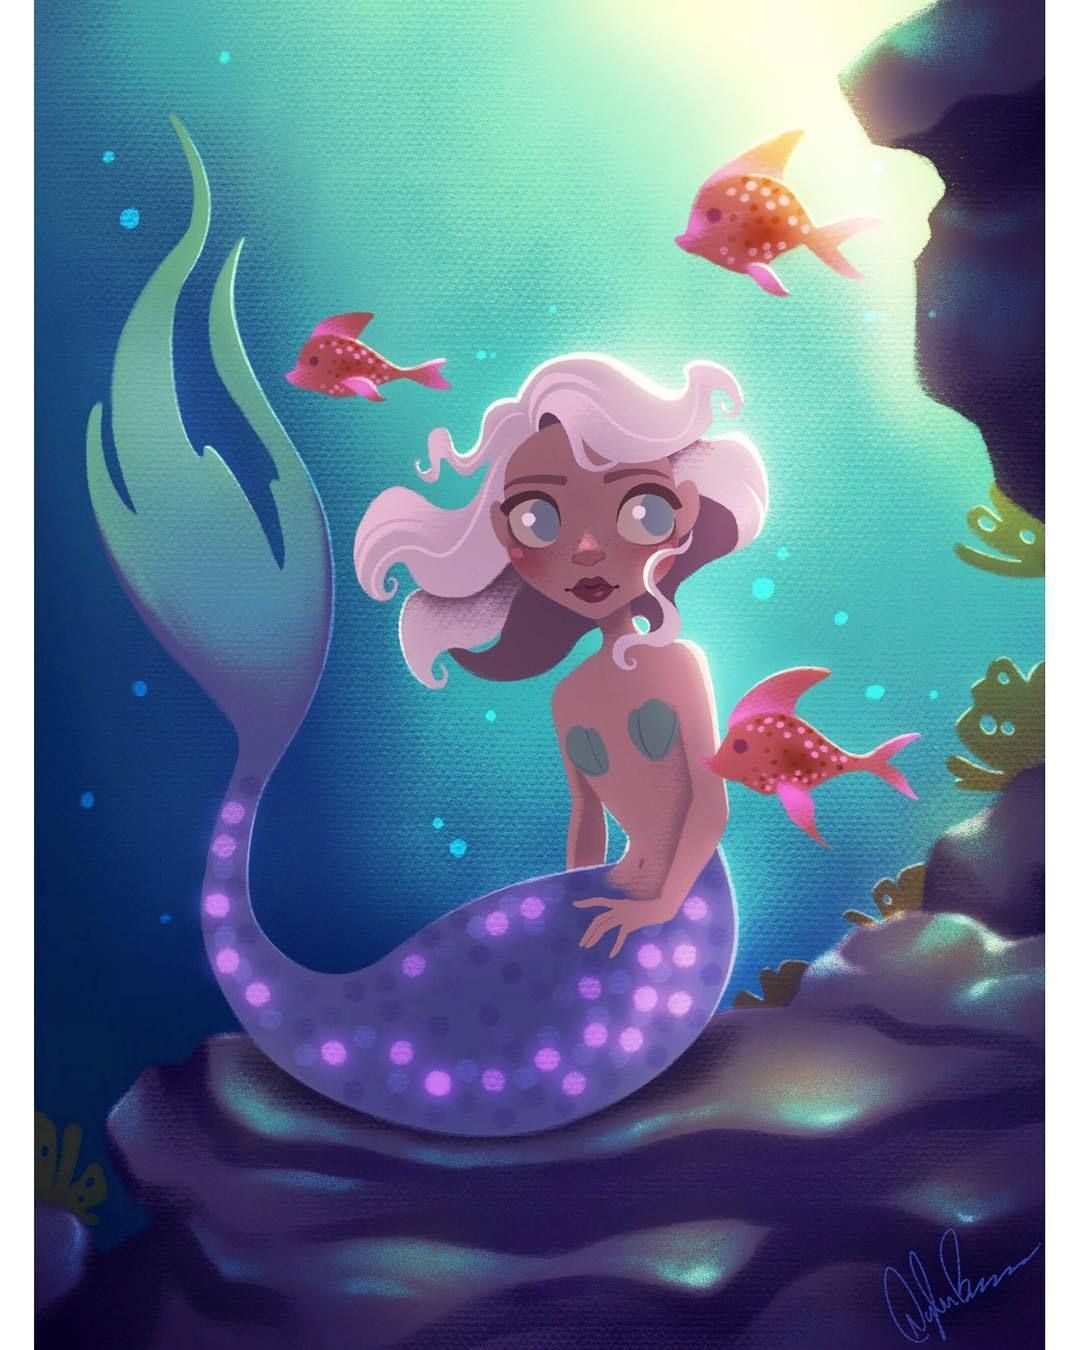 Merm With Short Lavender Hair #digitalart #digitalpainting #mermaid #mermaidhair #